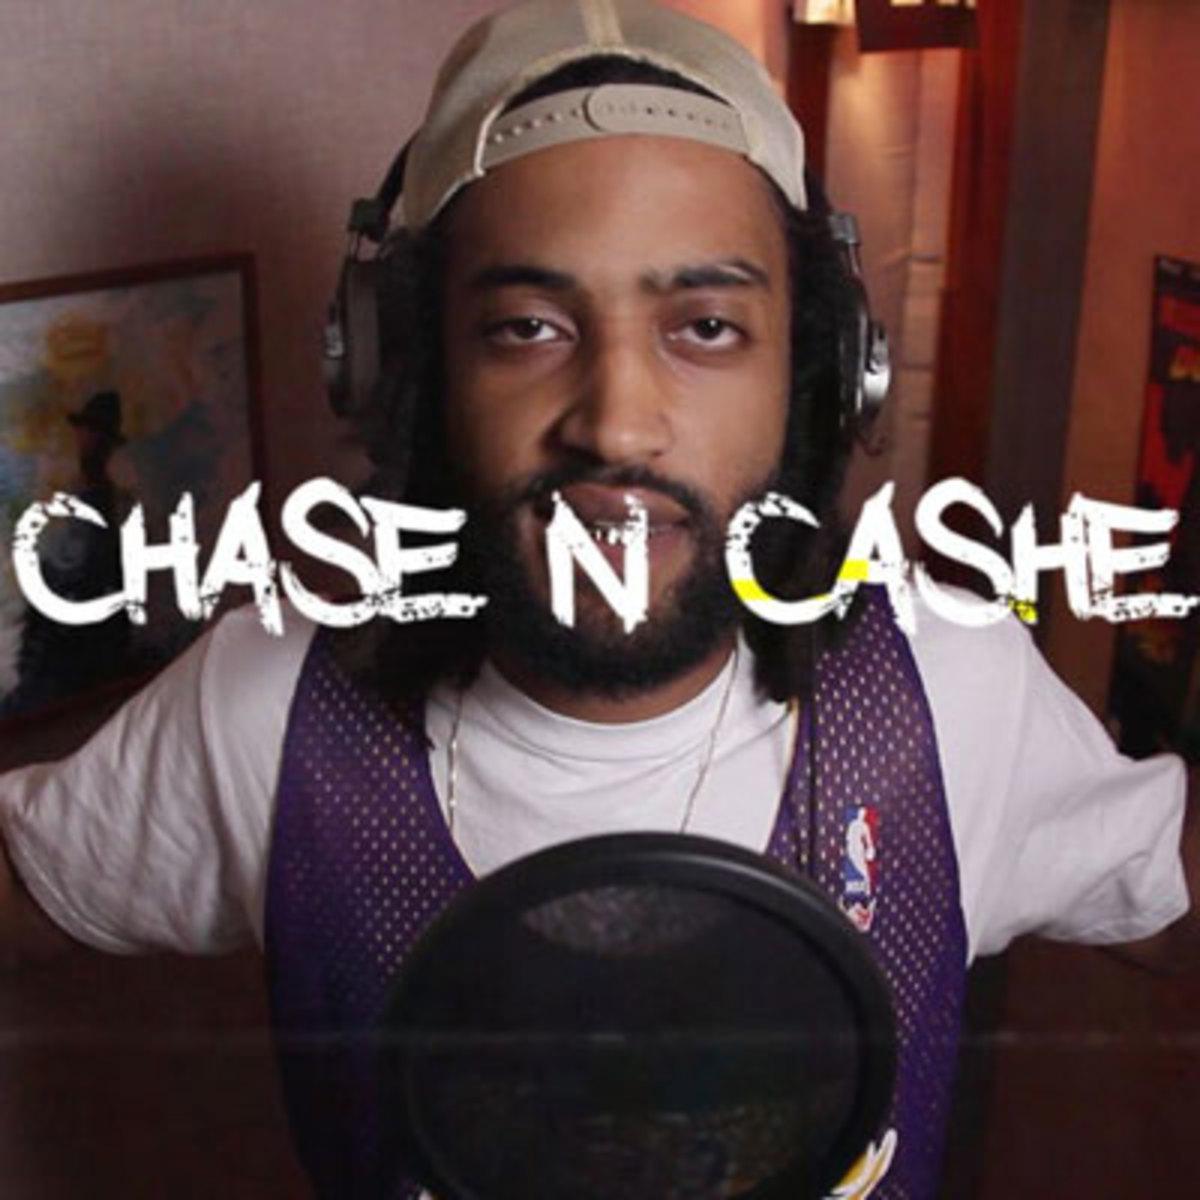 chase-n-cashe-btb-feature.jpg